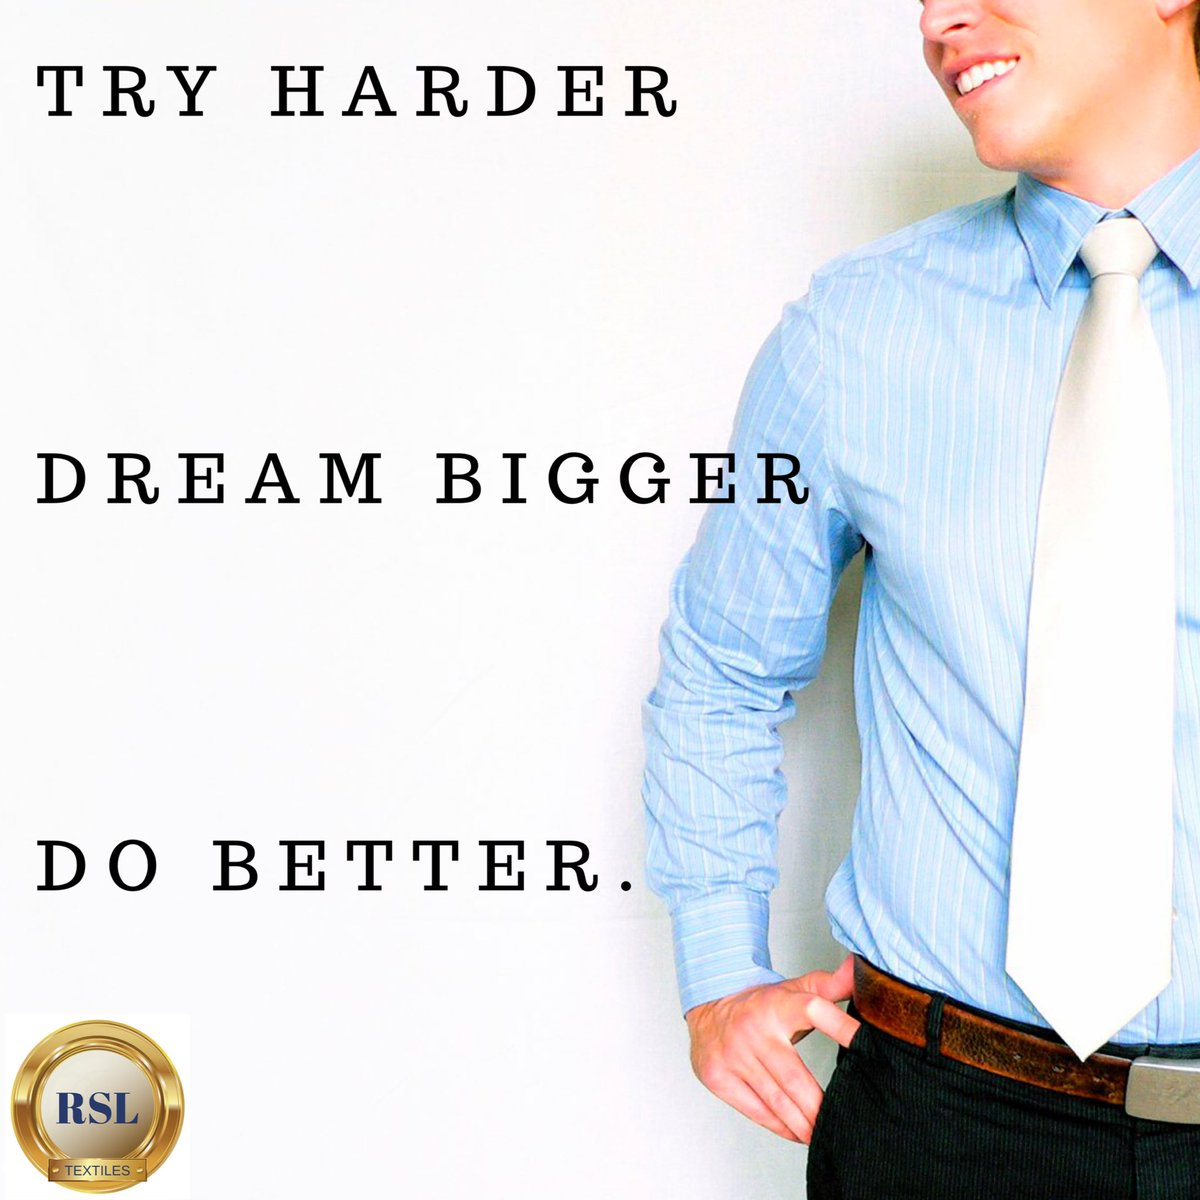 Try harder....Dream bigger ....Do better... #MondayMotivaton #mondaythoughts #MondayVibes #menswear https://t.co/nT7srfGuuR